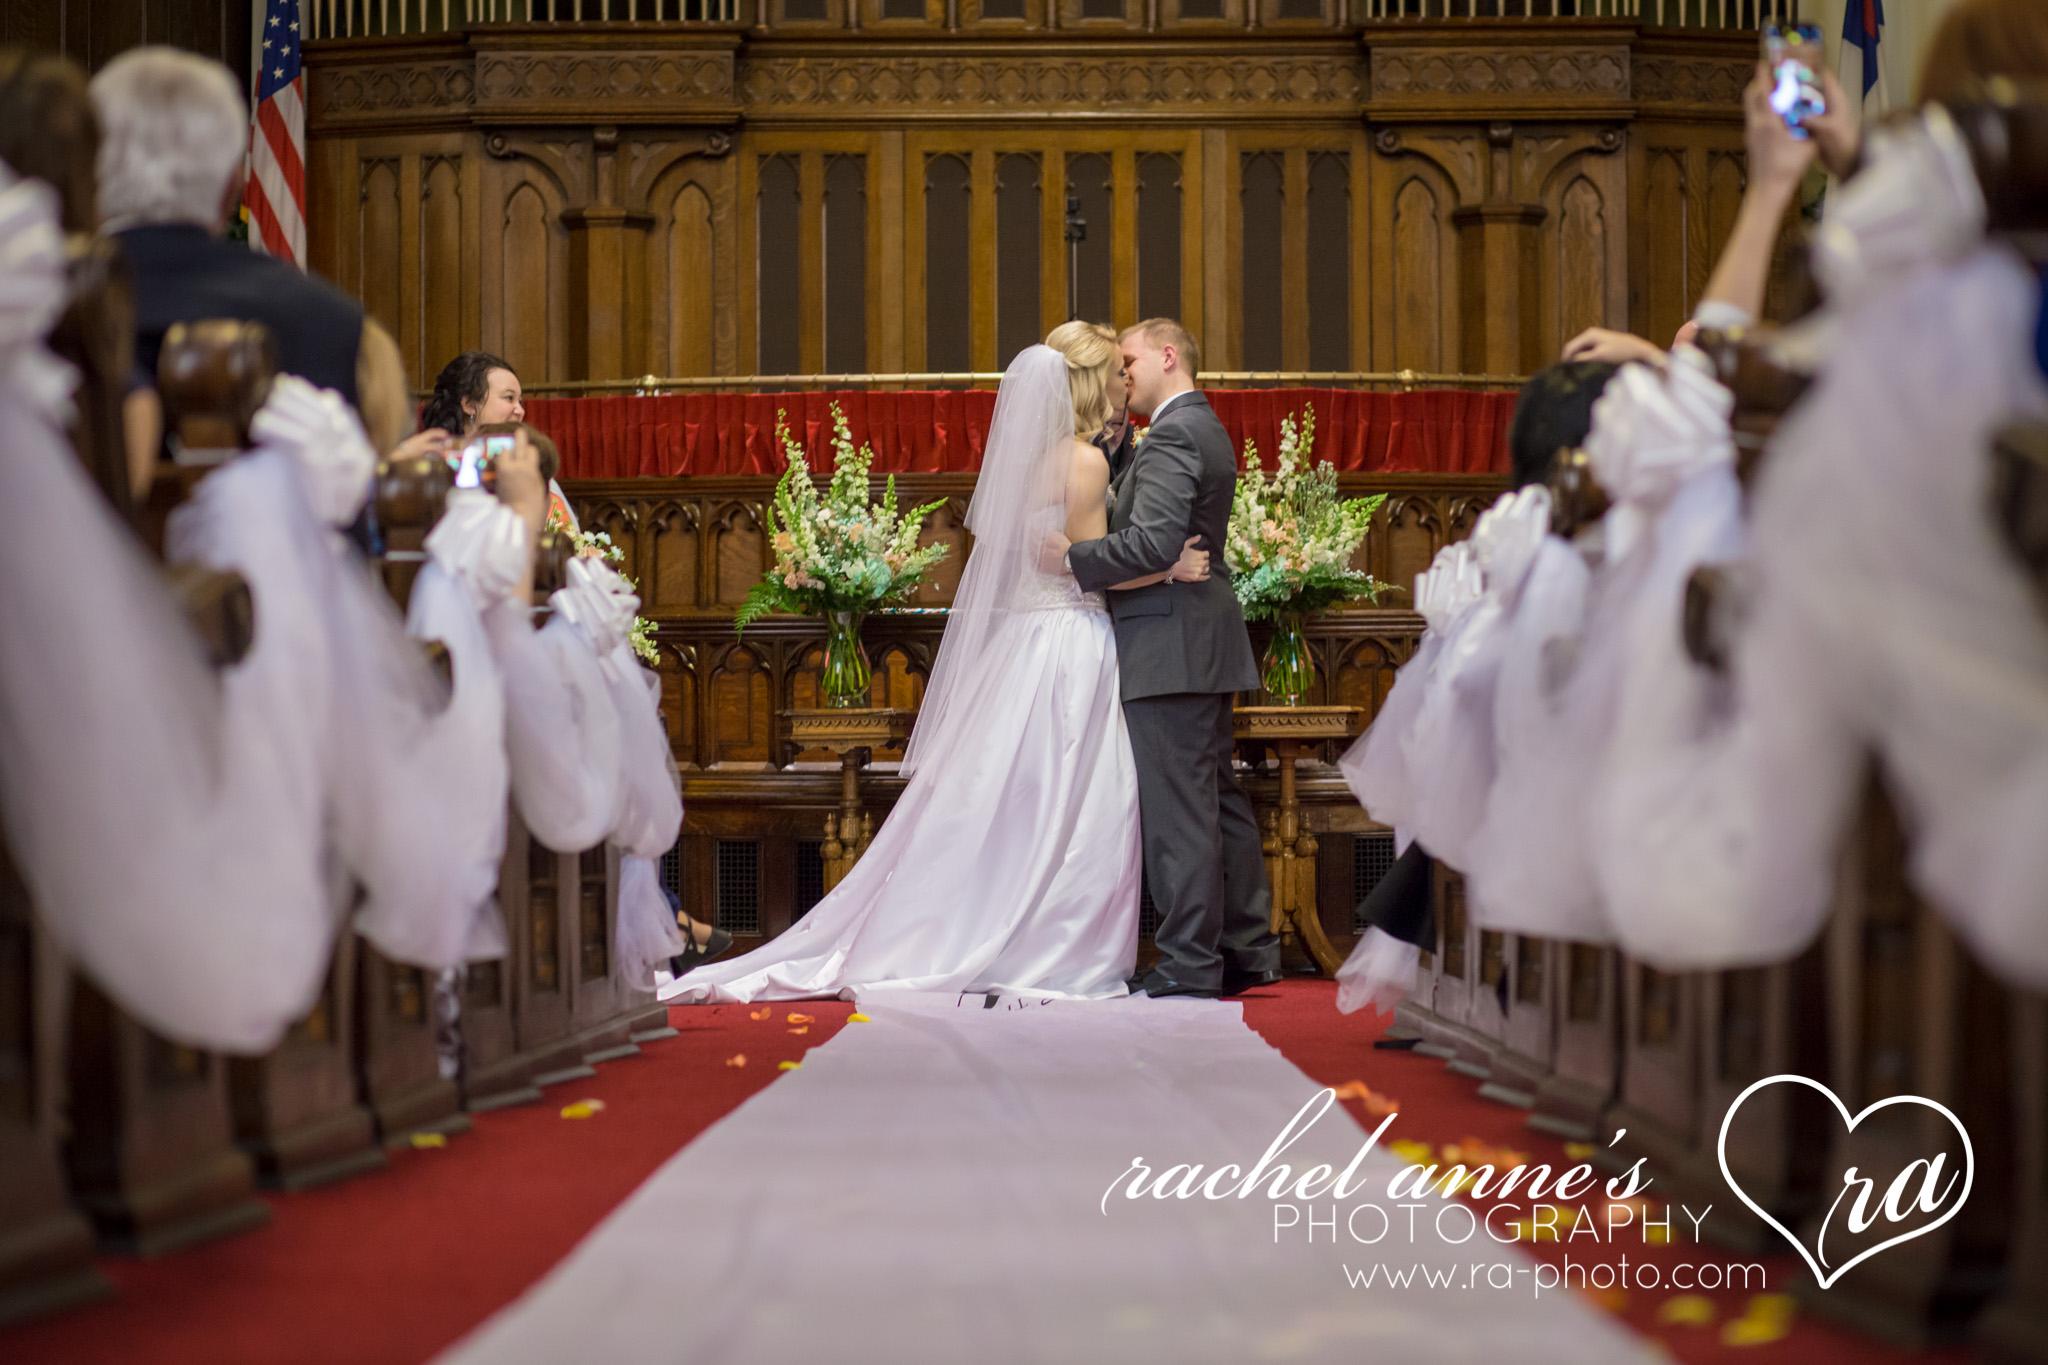 027-JKS-WEDDINGS-THE-FRANKLIN-PA.jpg